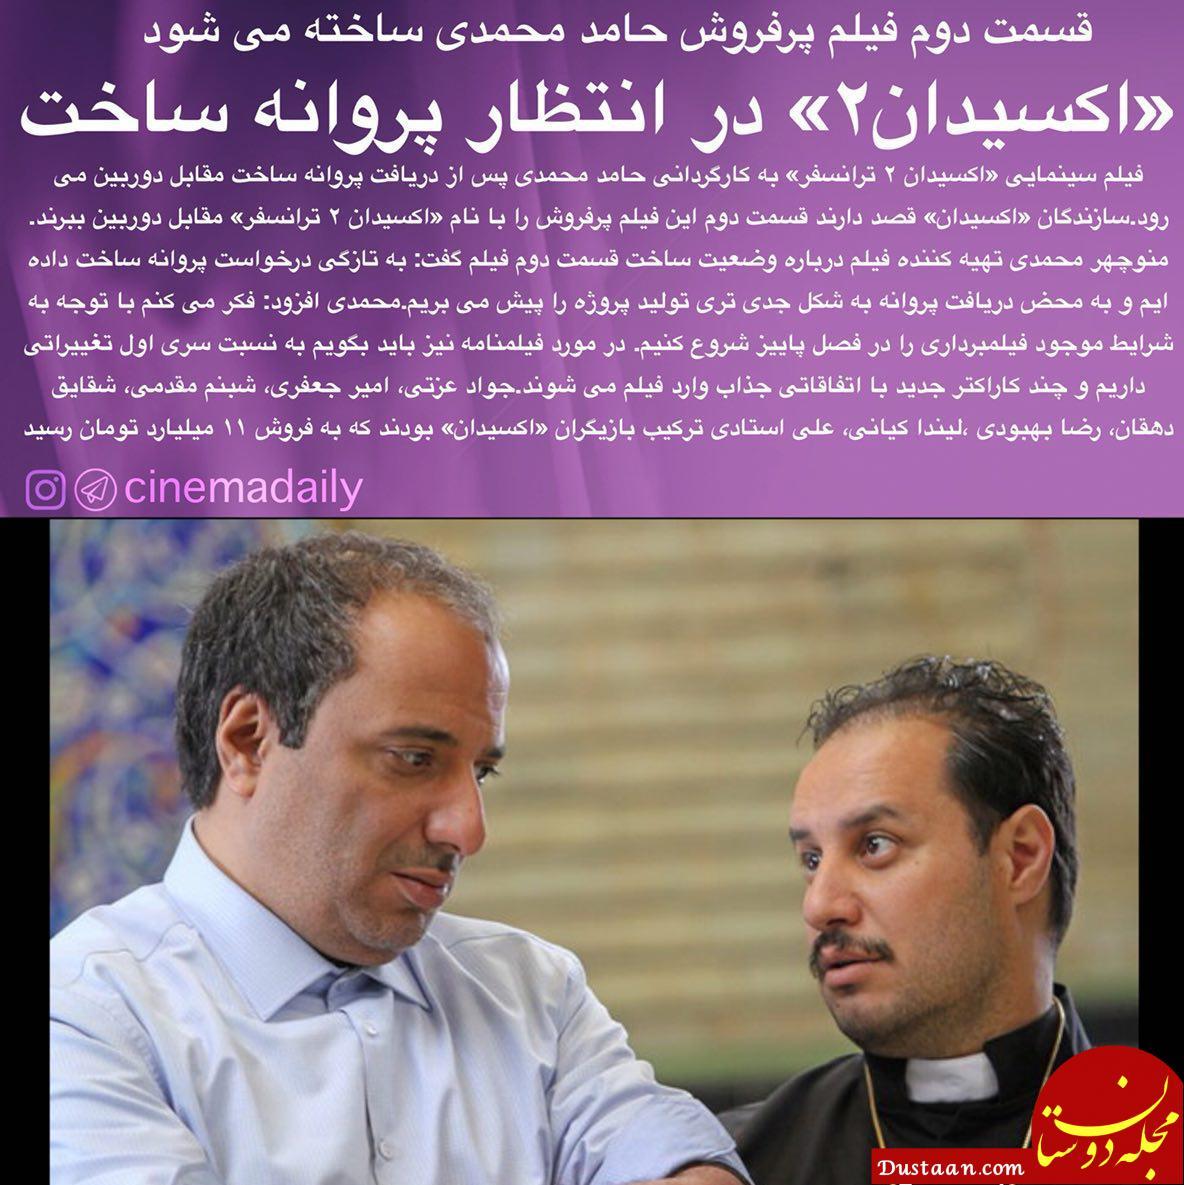 www.dustaan.com «اکسیدان 2» در انتظار پروانه ساخت +عکس